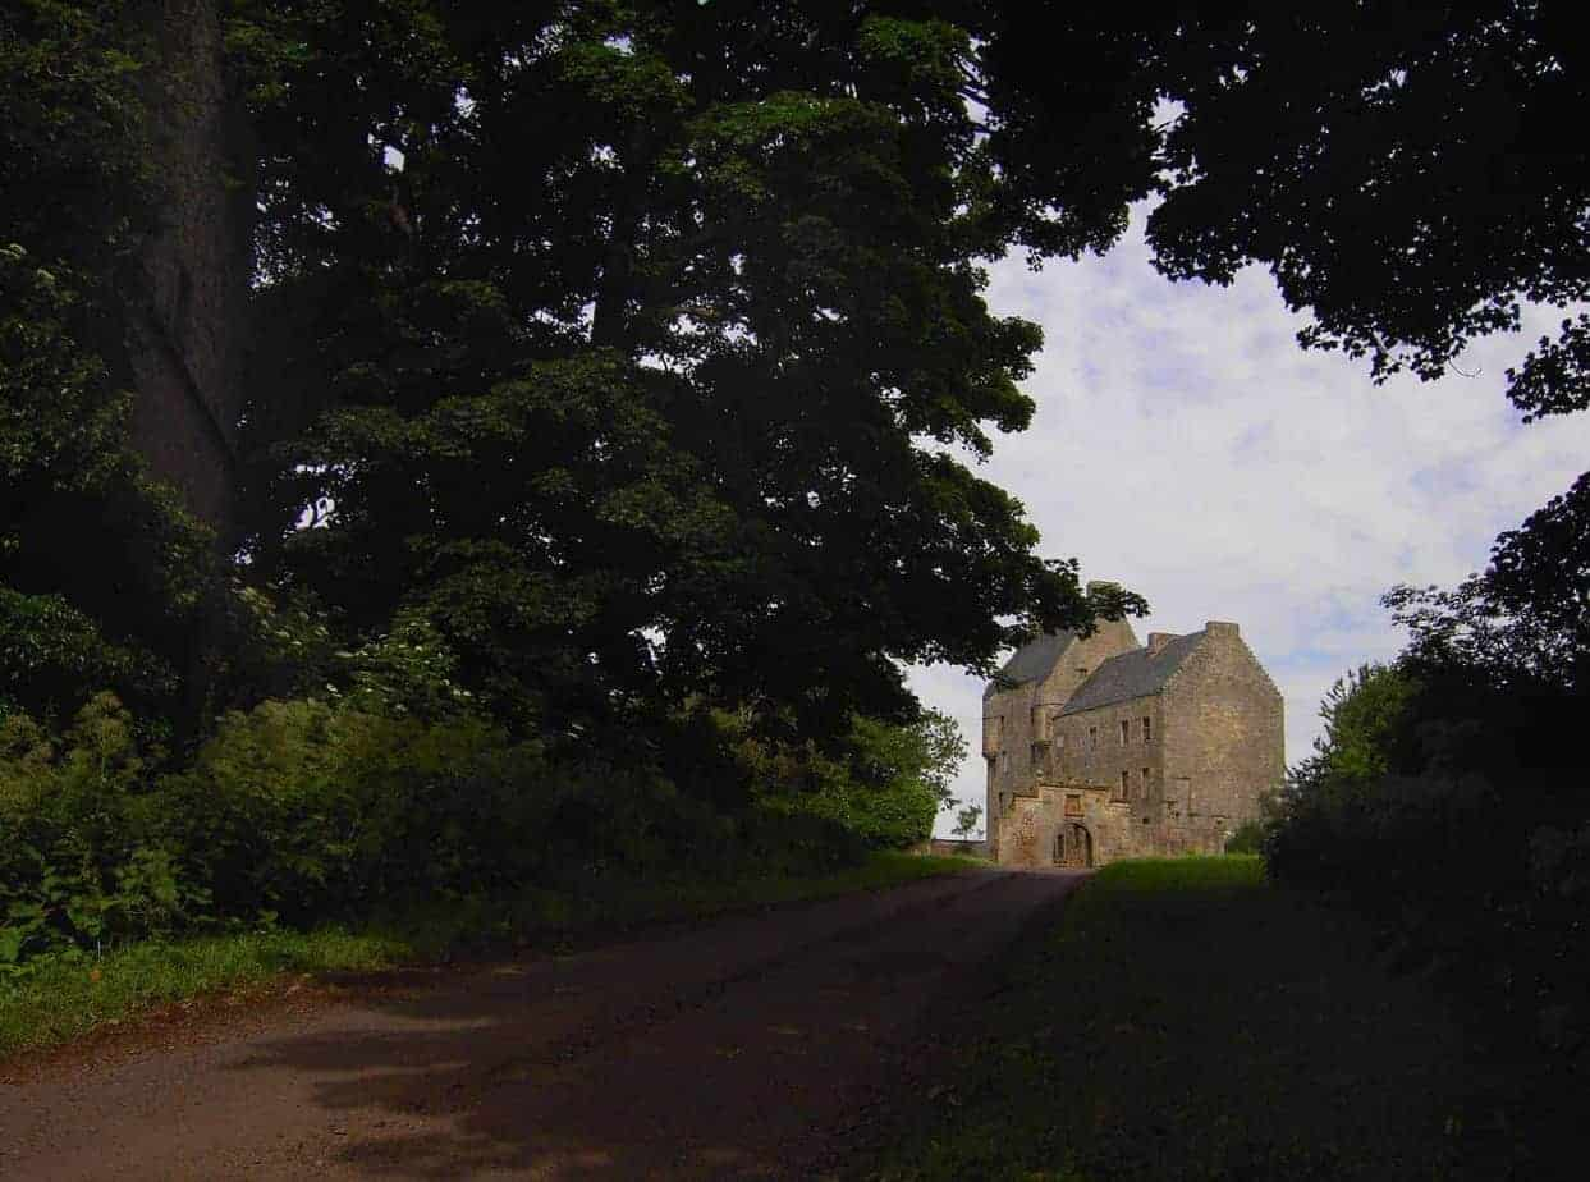 Escape Pod – Outlander TV and Book Series – Jamie, Claire, and Scotland